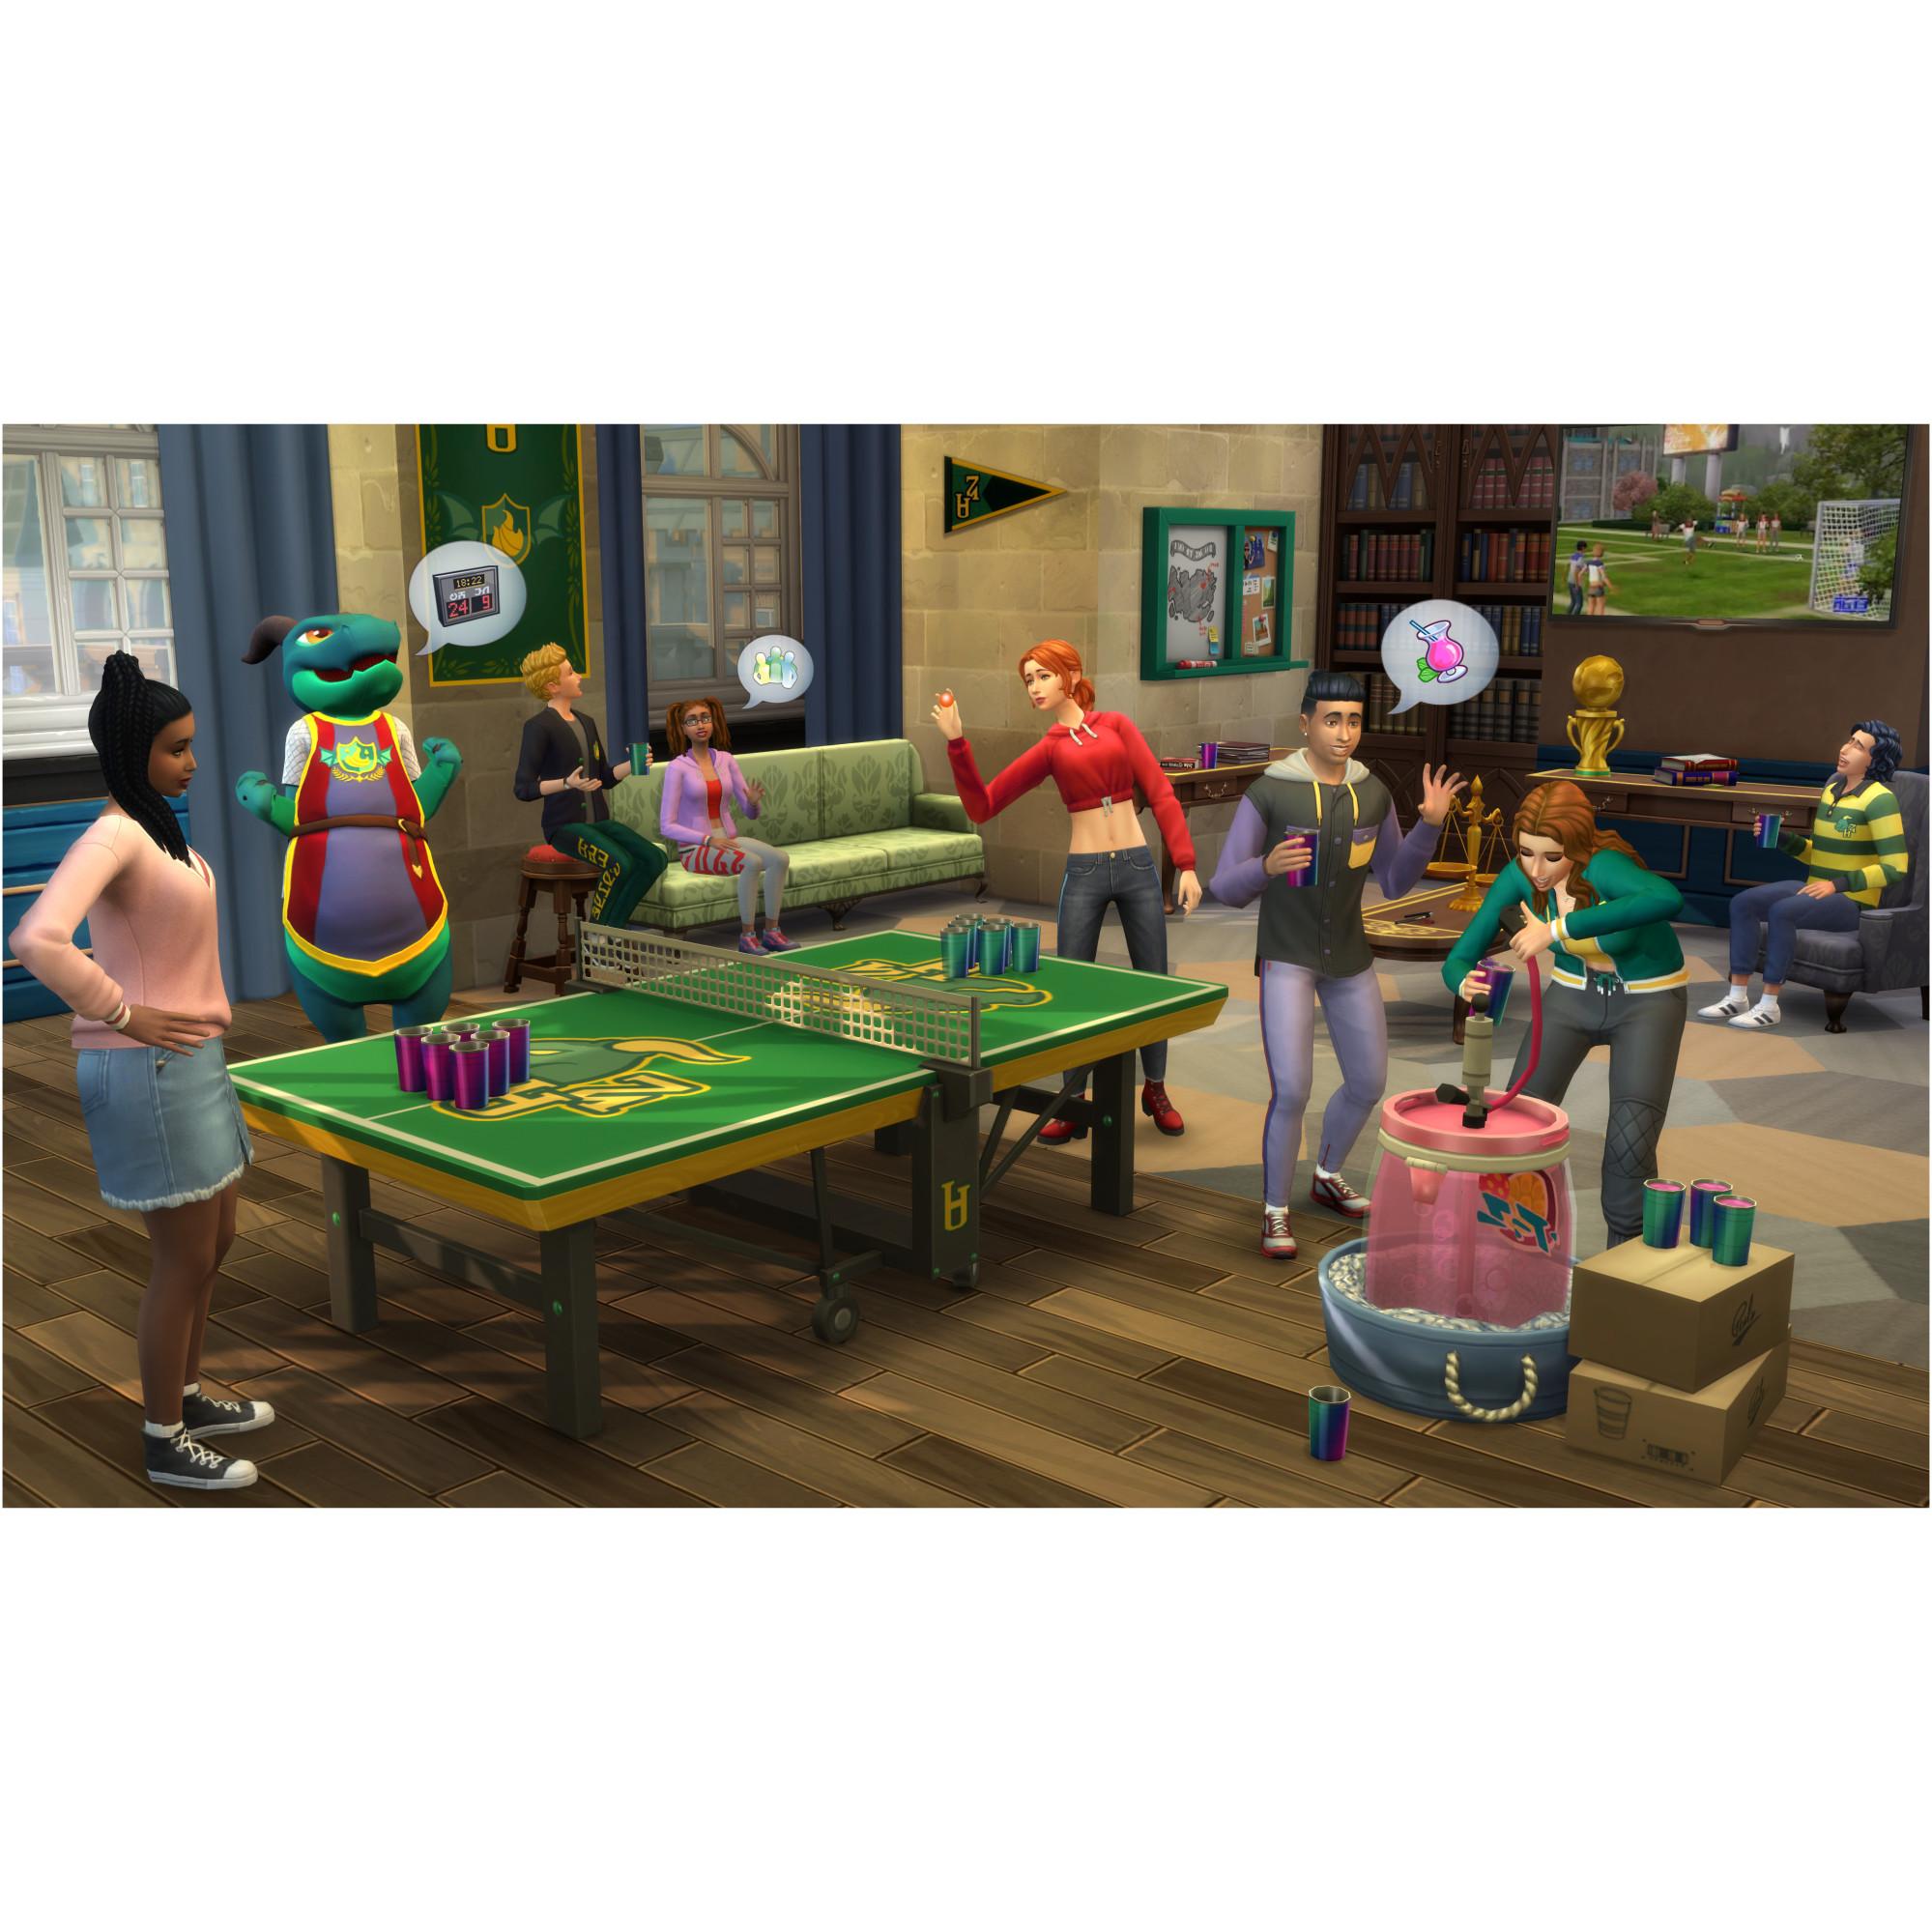 Expansiune The Sims 4 EP8 Discover University pentru PC 1